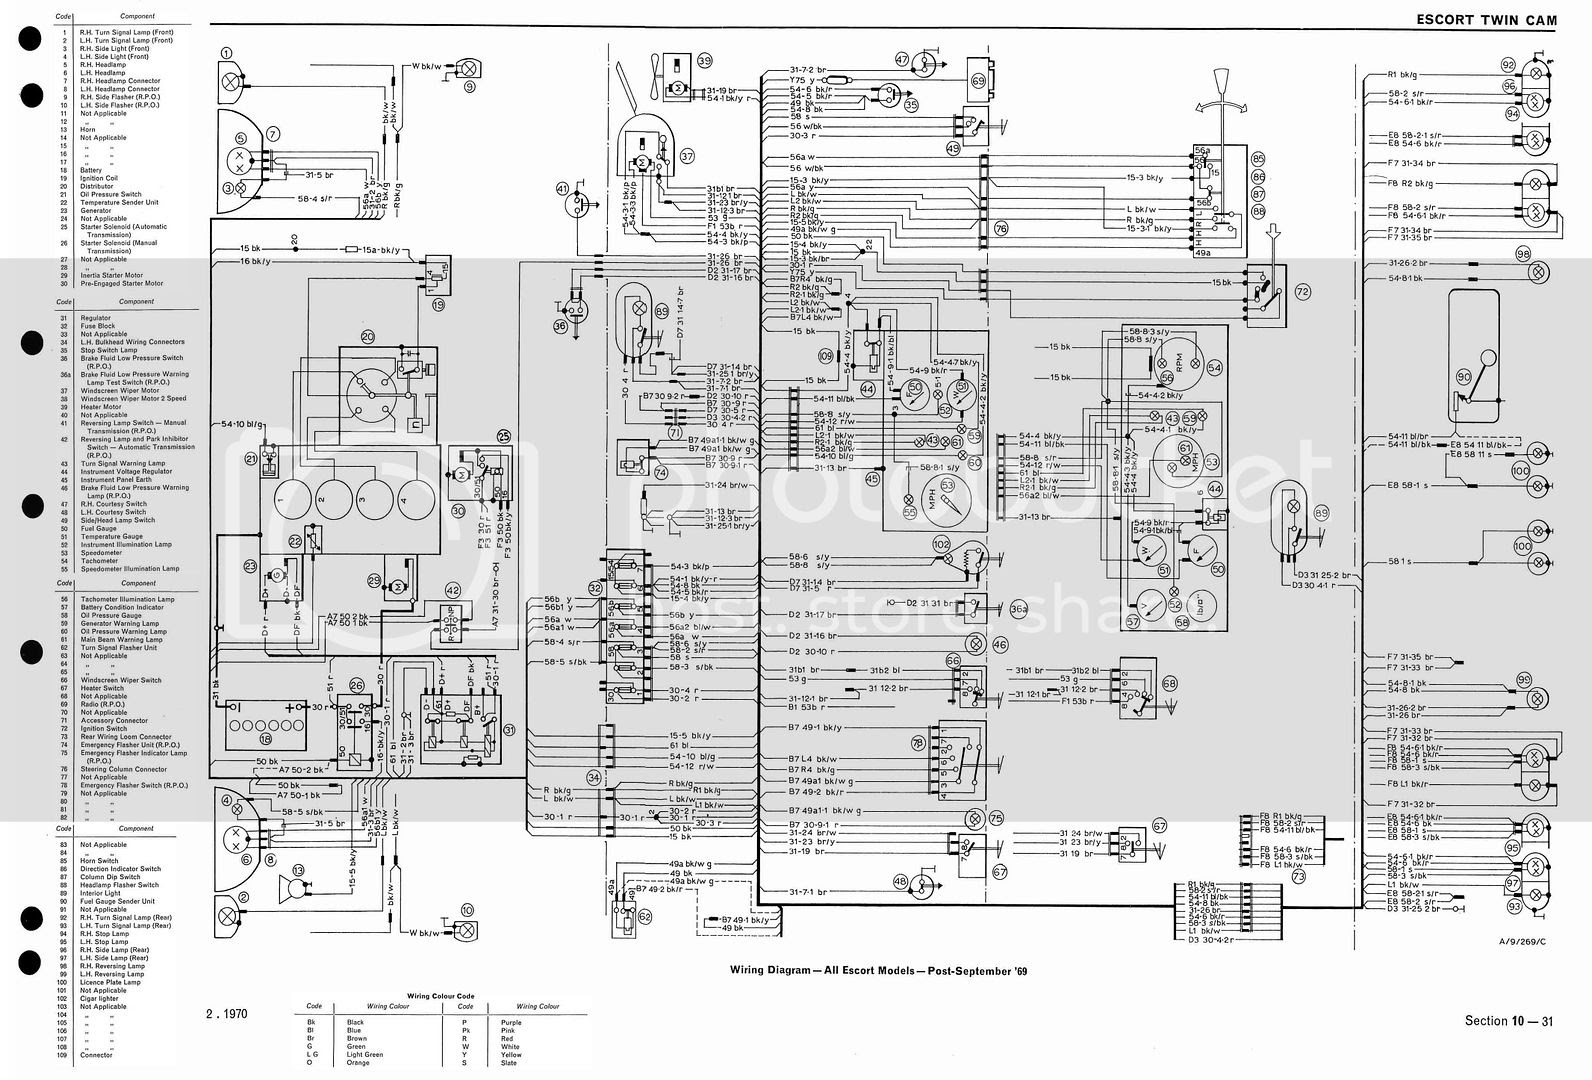 89 honda civic stereo wiring diagram uss monitor acura legend hp photosmart printer